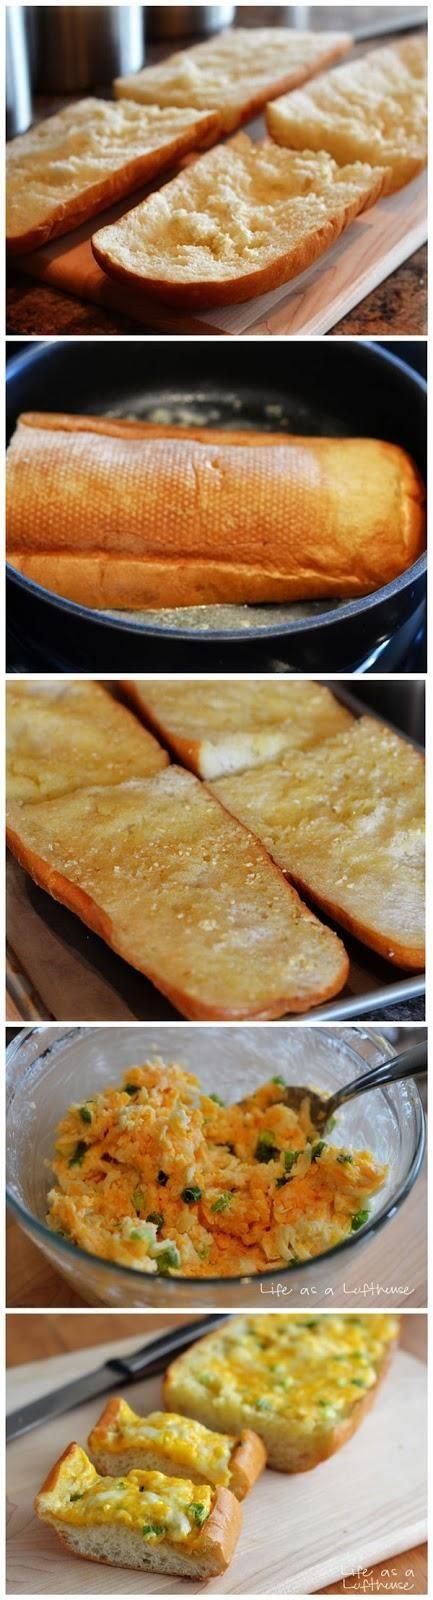 Garlic Cheese Bread - Fork say | Food | Pinterest